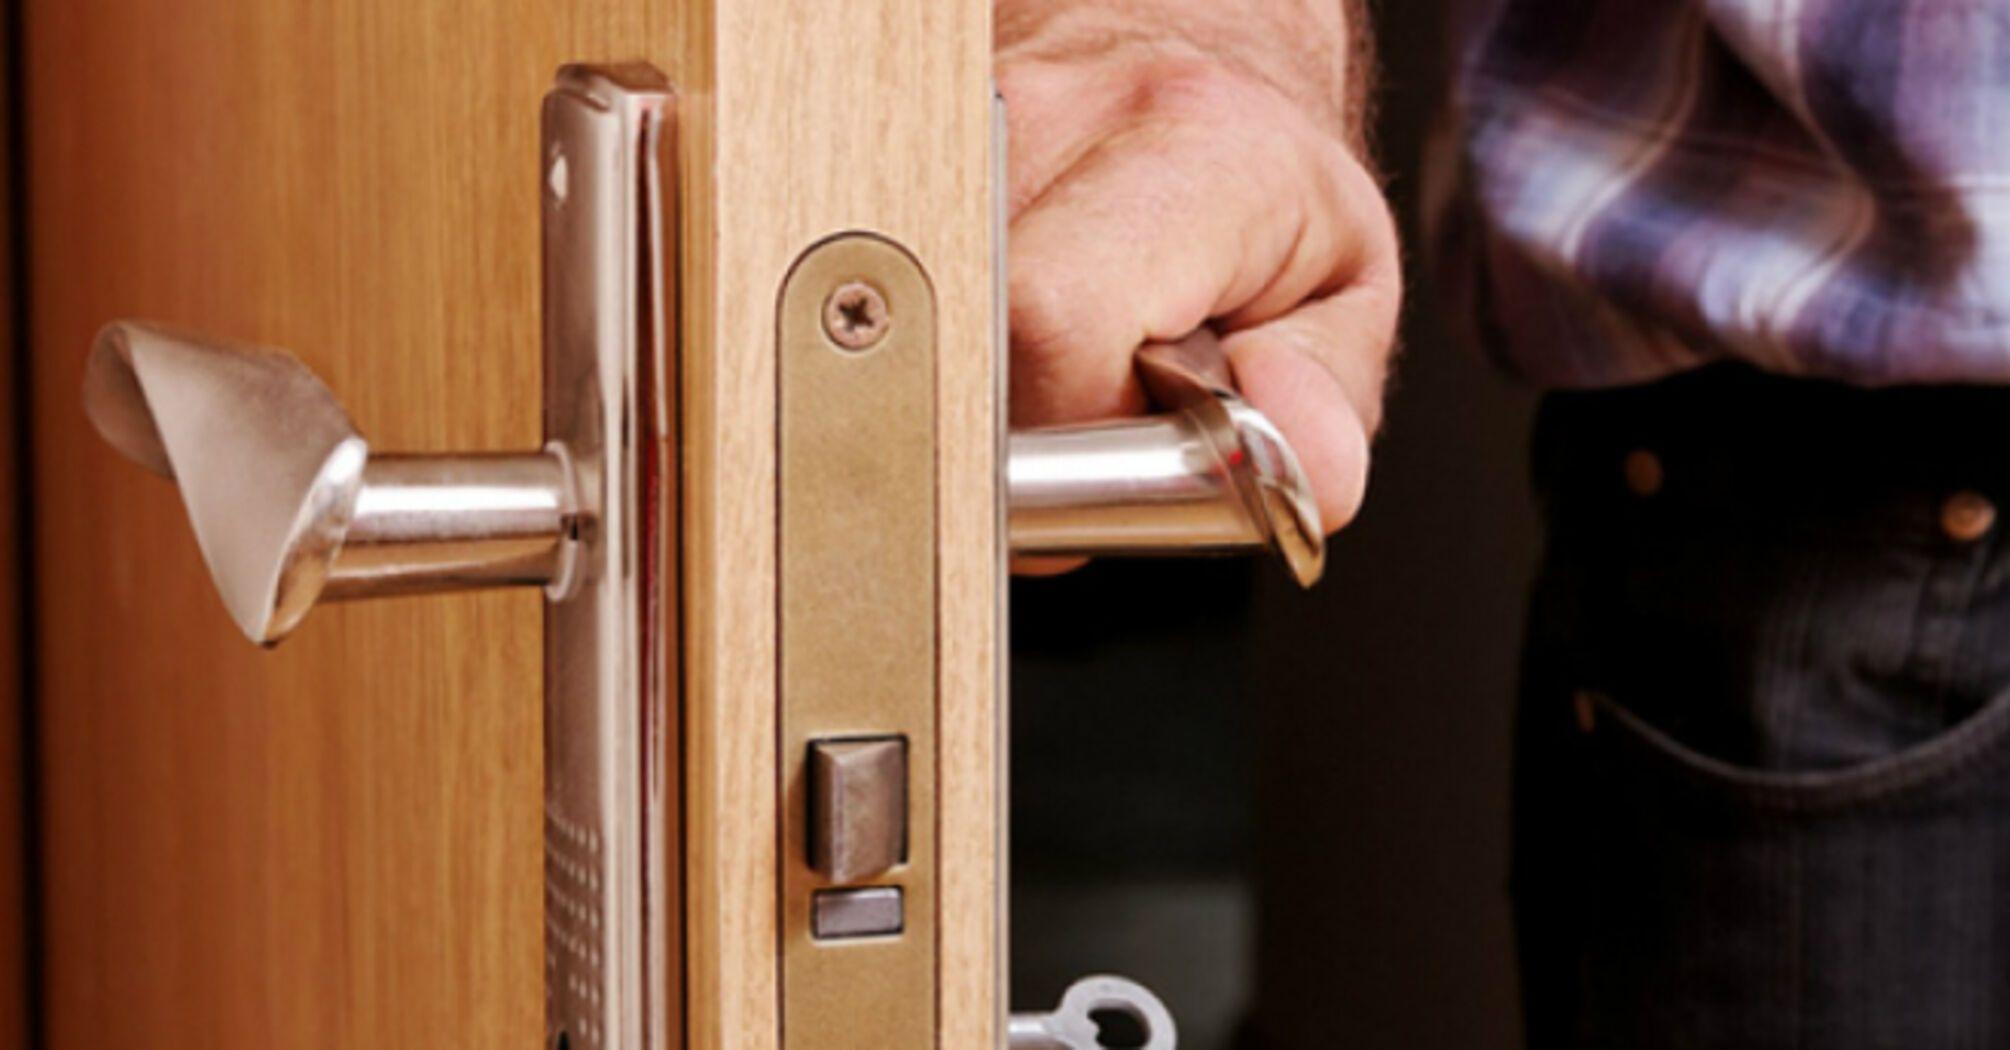 Цены на квартиры будут расти: эксперты назвали цифры